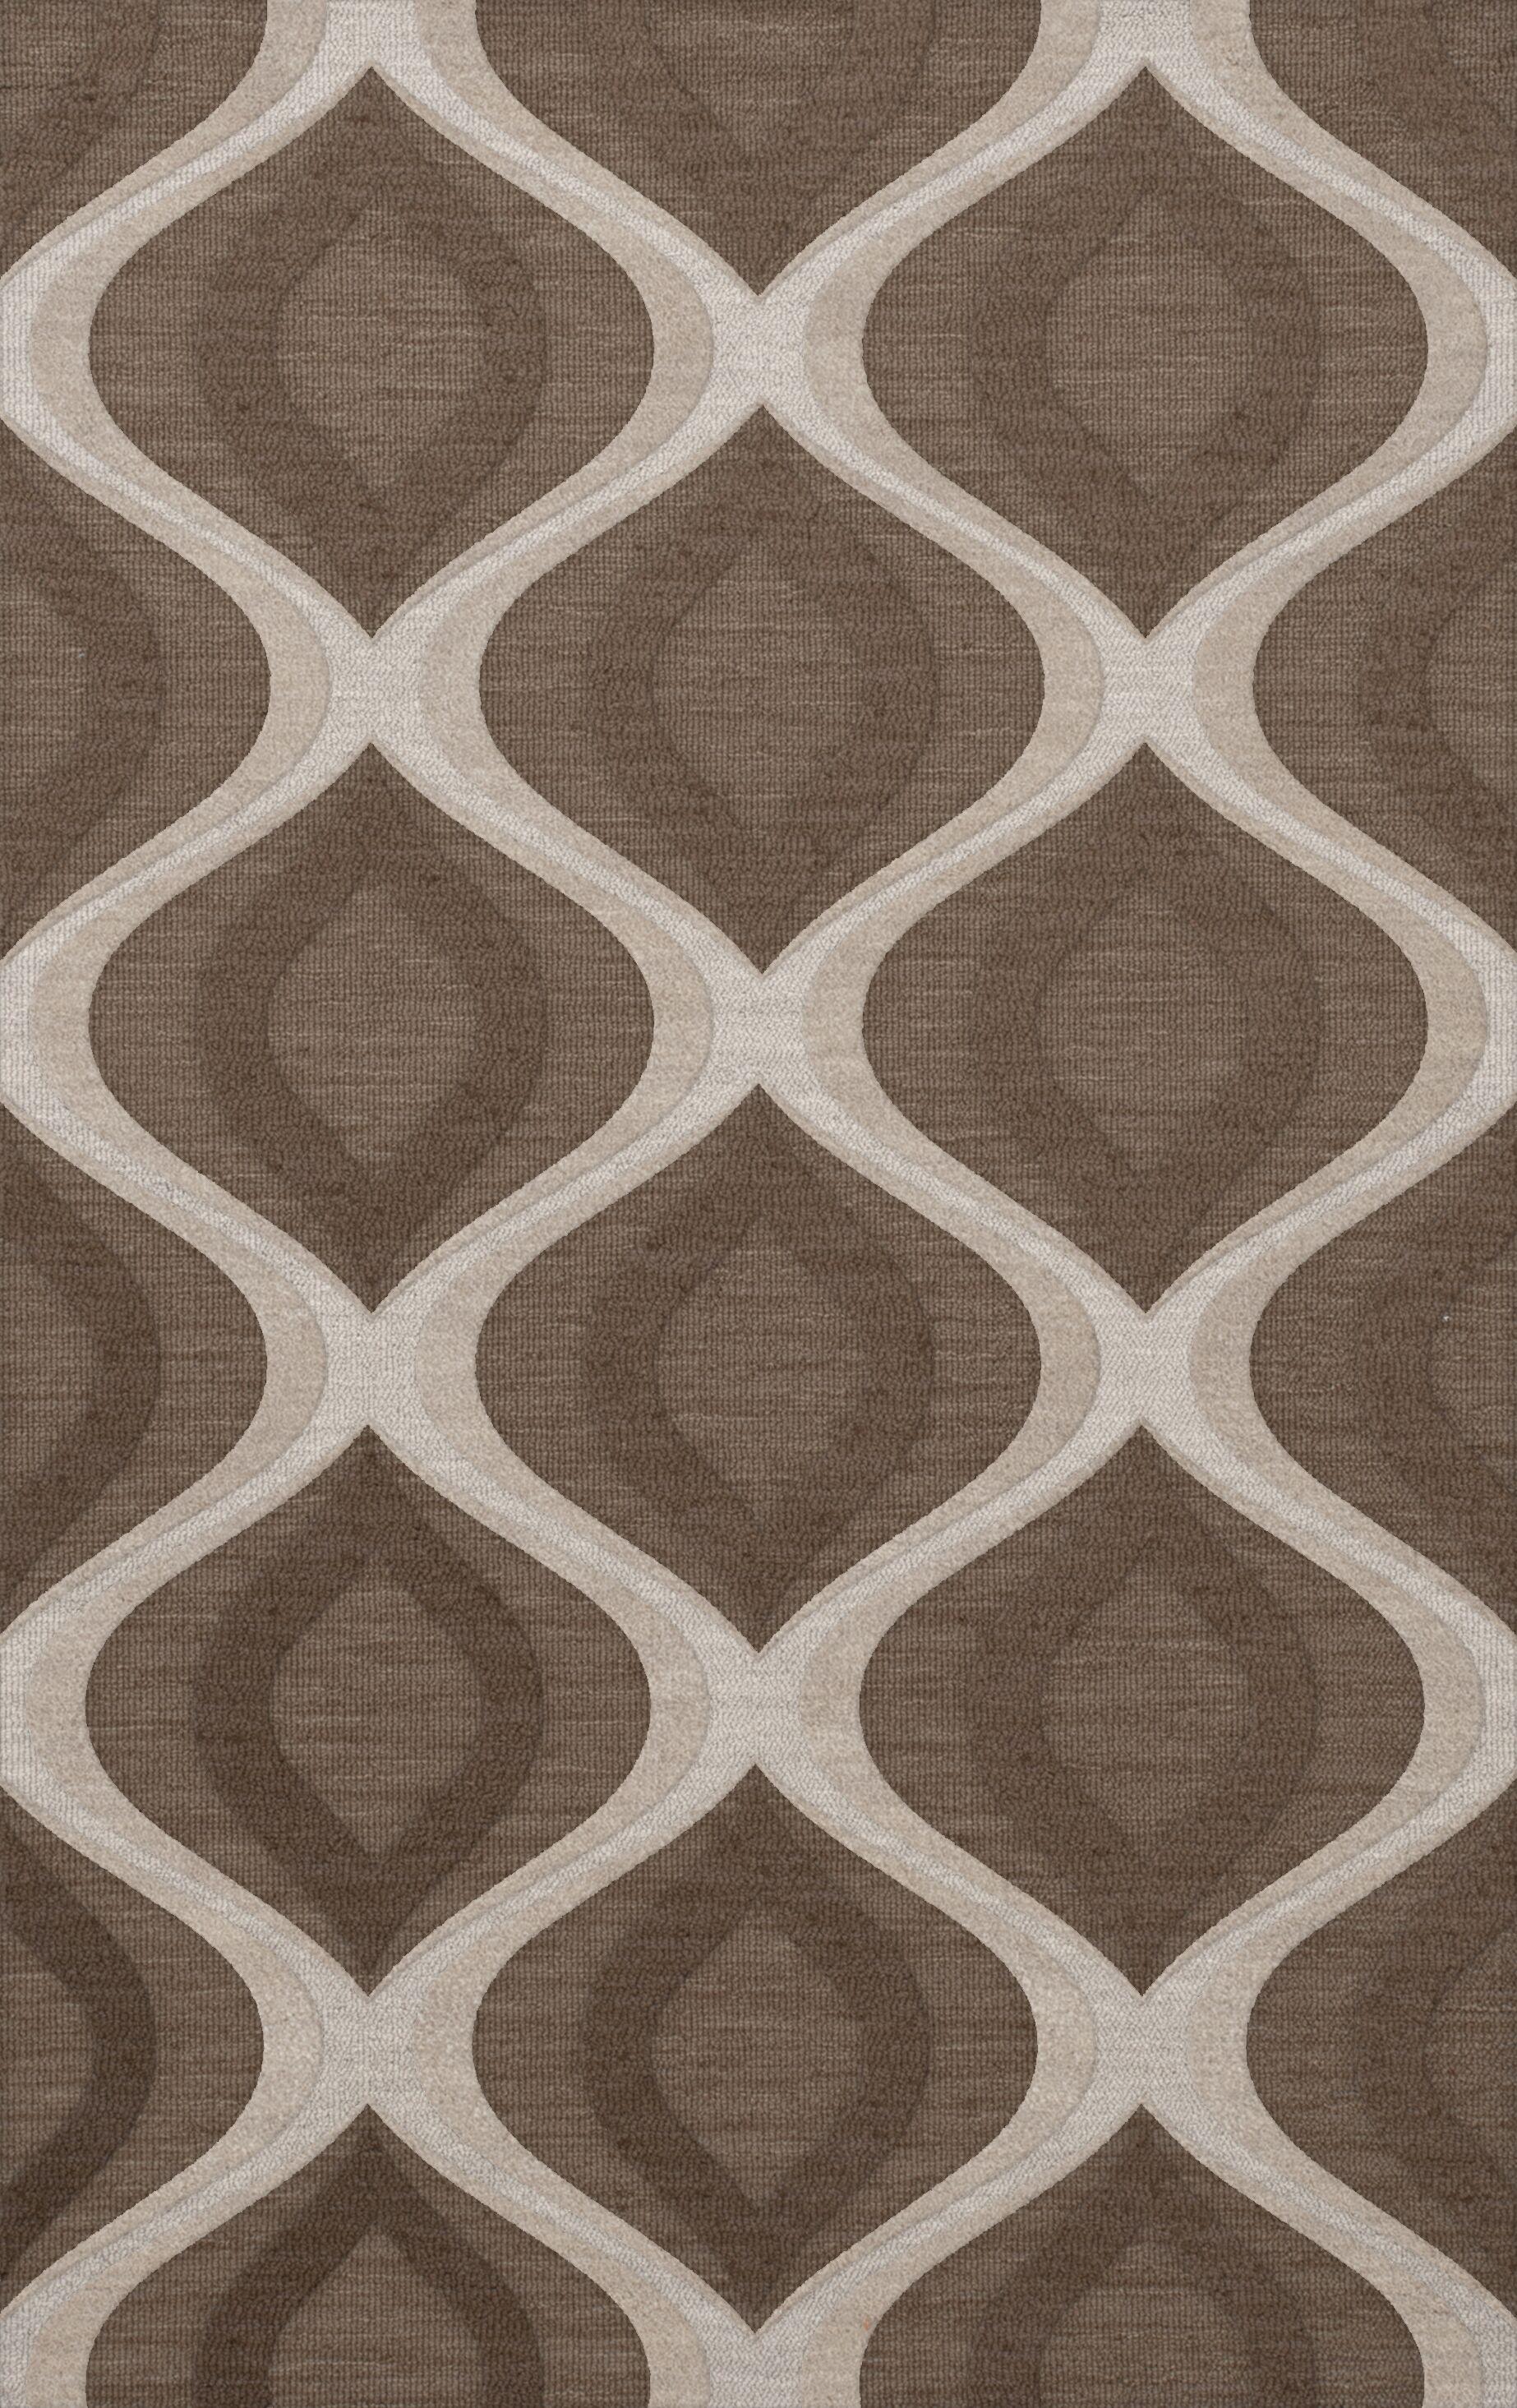 Kaidence Wool Pebble Area Rug Rug Size: Rectangle 5' x 8'